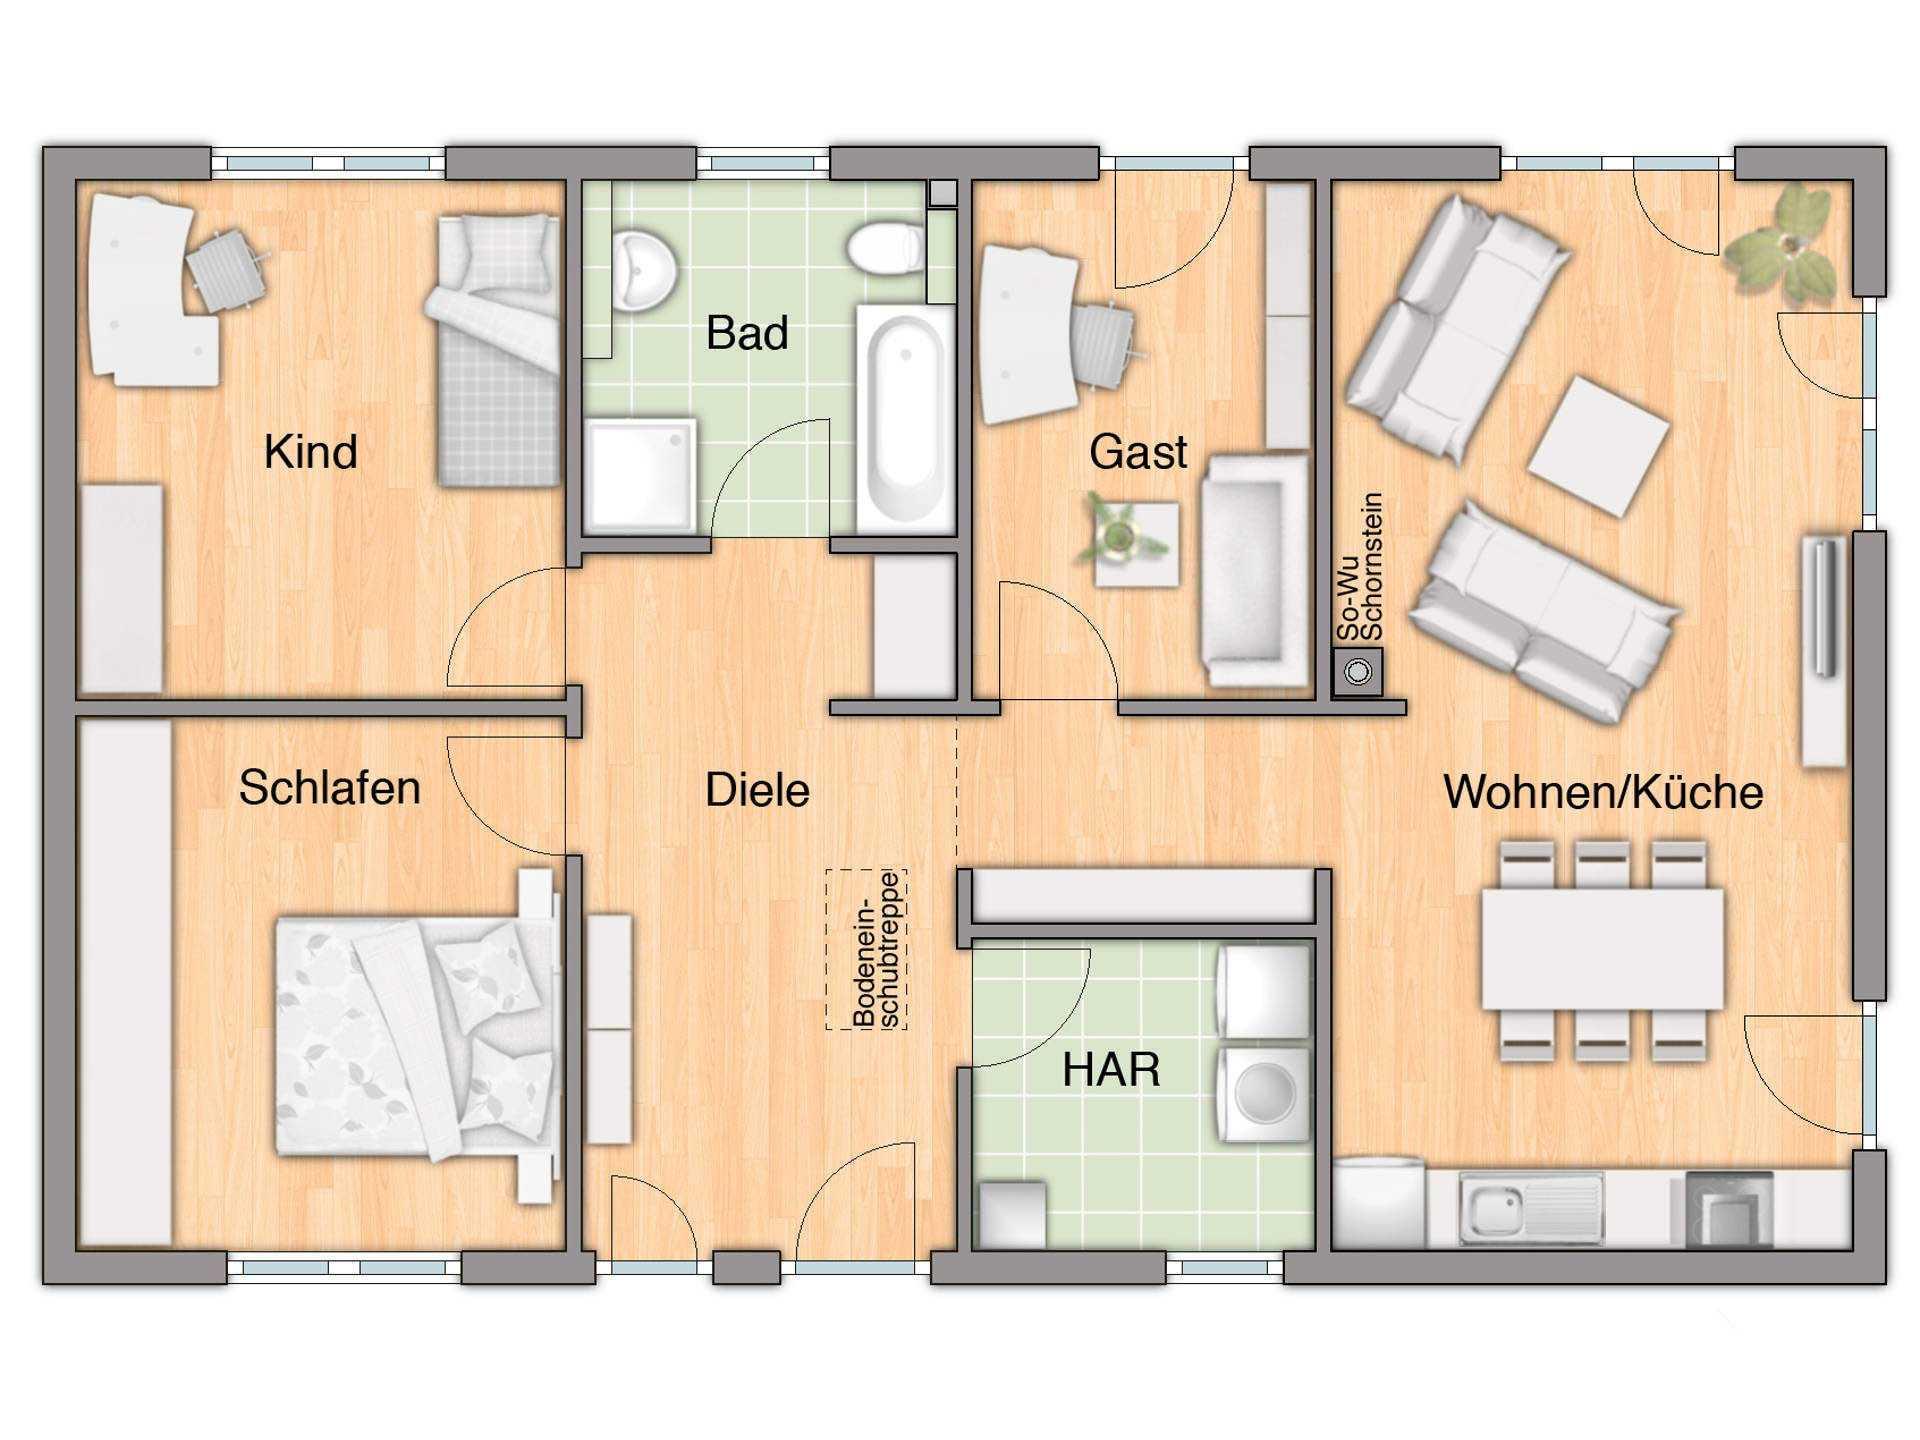 bungalow grundriss bungalow haus grundriss luxus grundriss haus grundriss. Black Bedroom Furniture Sets. Home Design Ideas